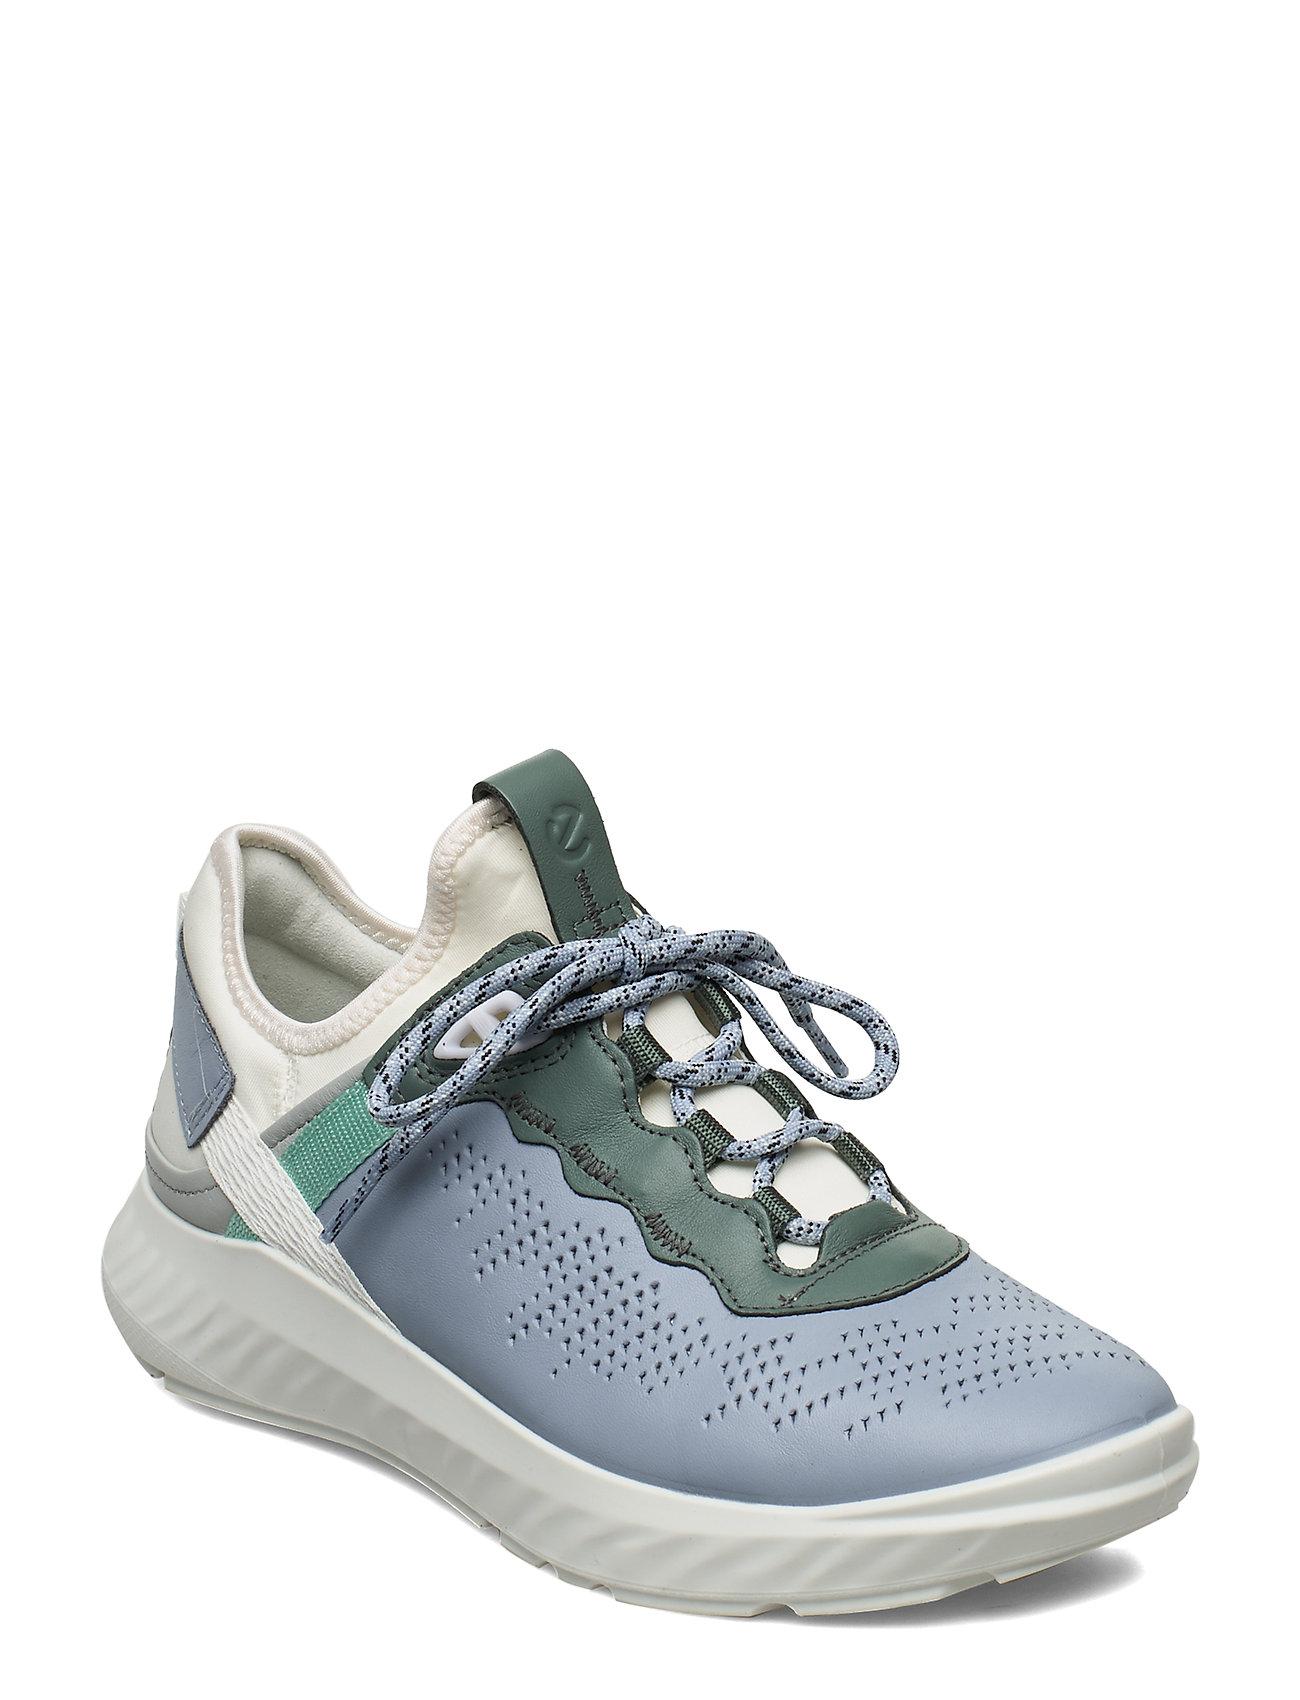 Image of St.1 Lite W Low-top Sneakers Blå ECCO (3354380763)